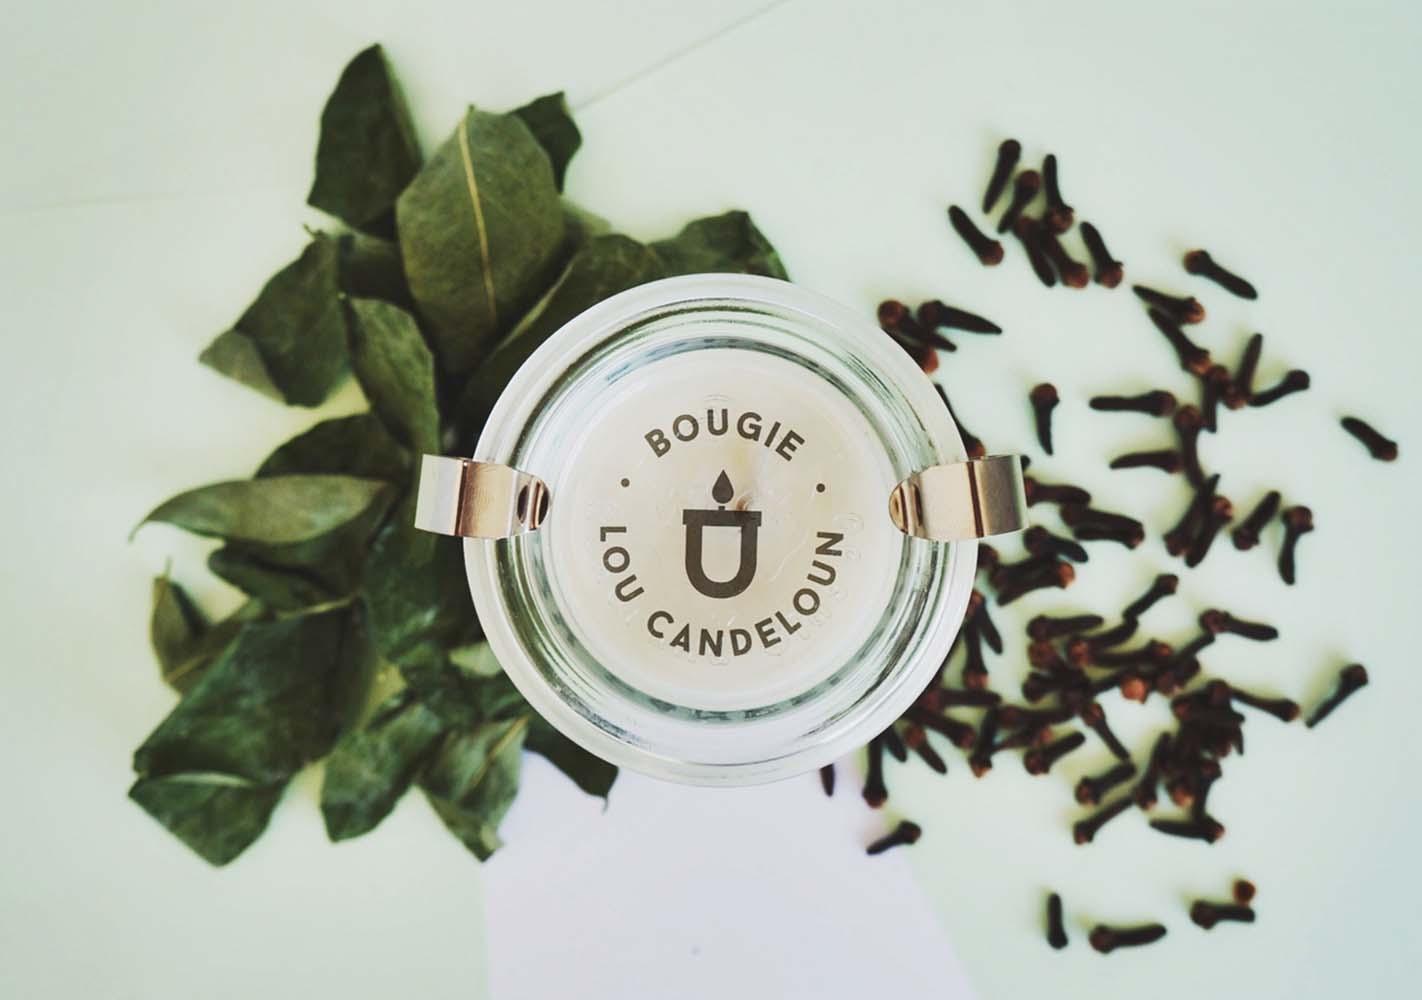 Bougie Sauge et girofle - LOU CANDELOUN